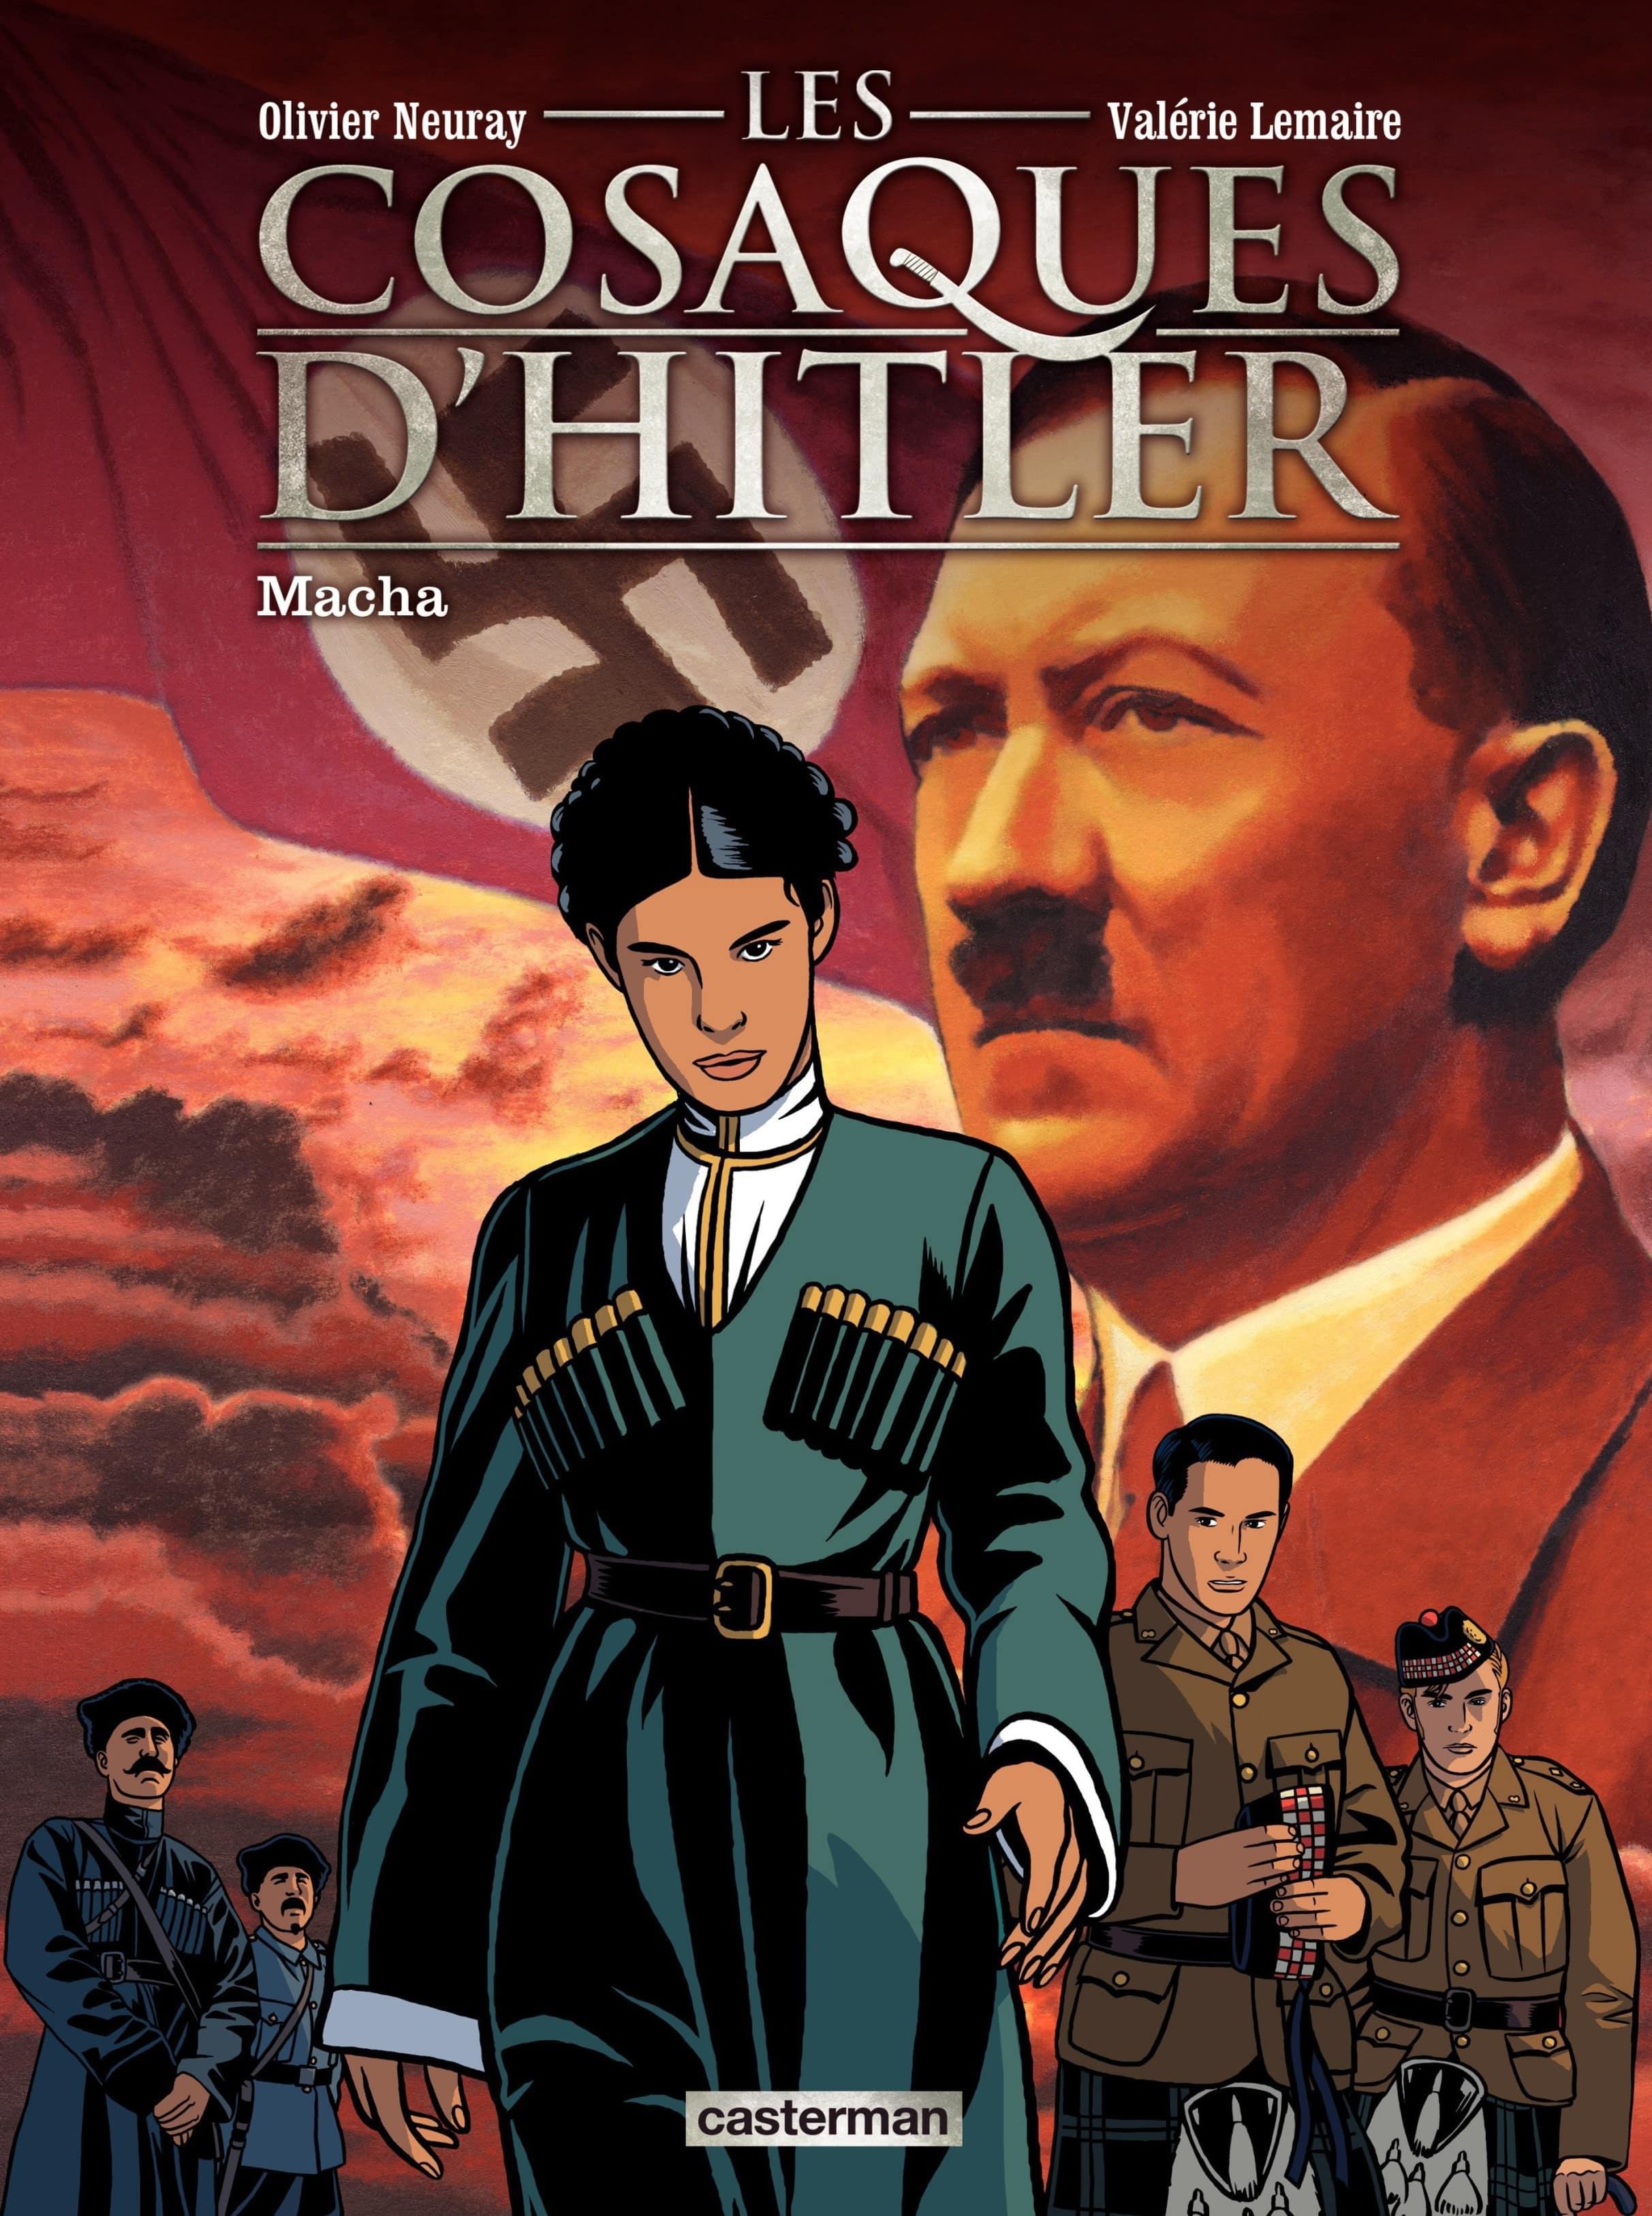 Le destin tragique des Cosaques d'Hitler